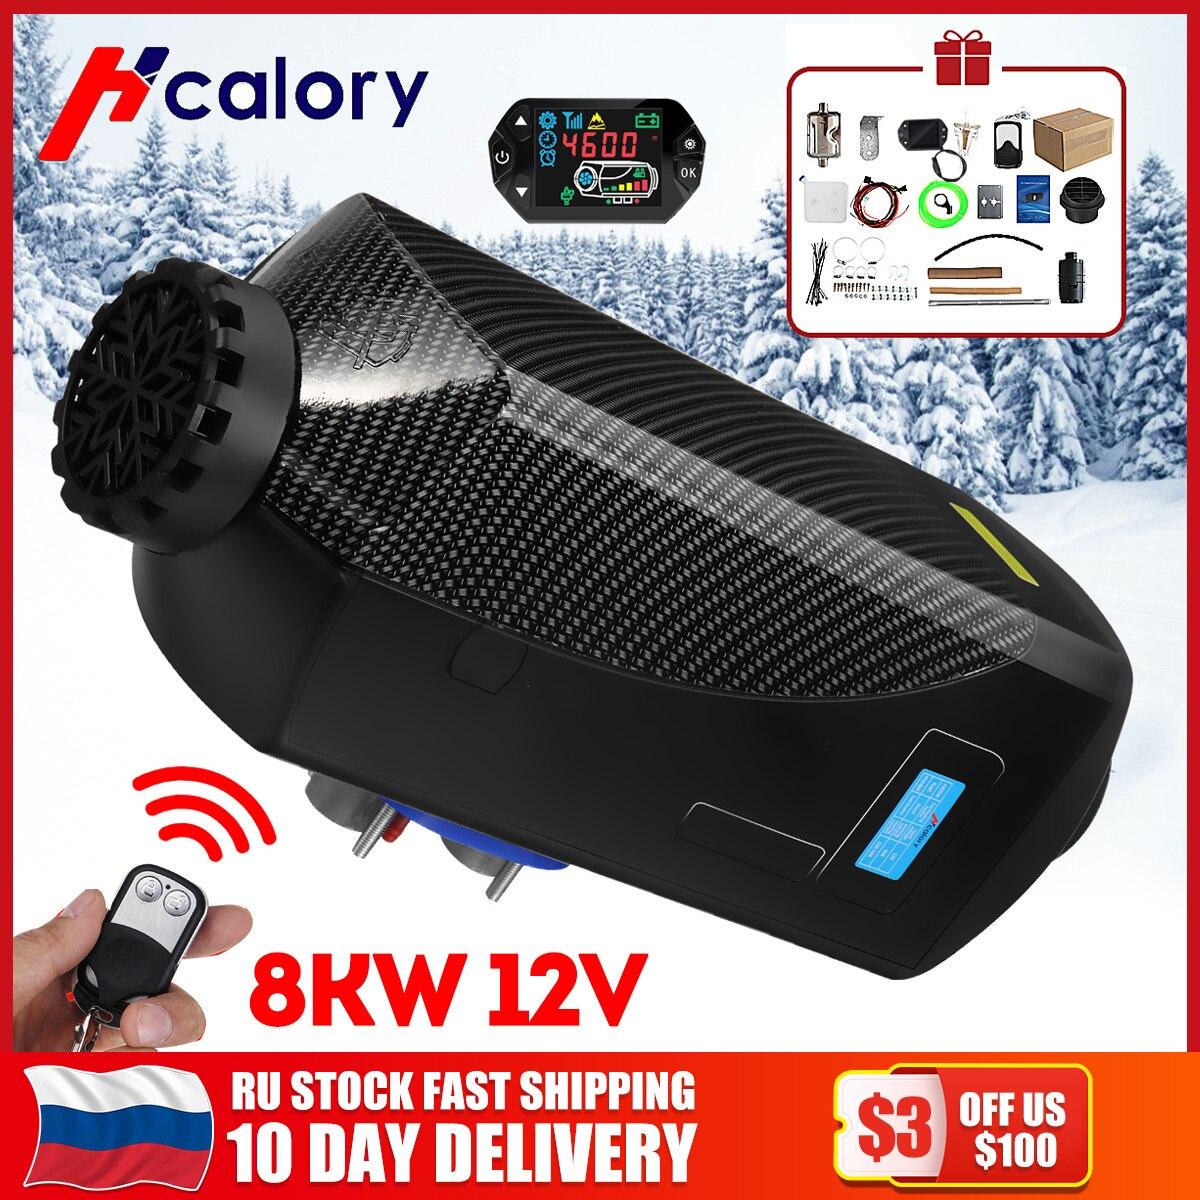 12V 8KW Diesel Air Parking Heater Air Heating Digital Thermostat with Silencer U